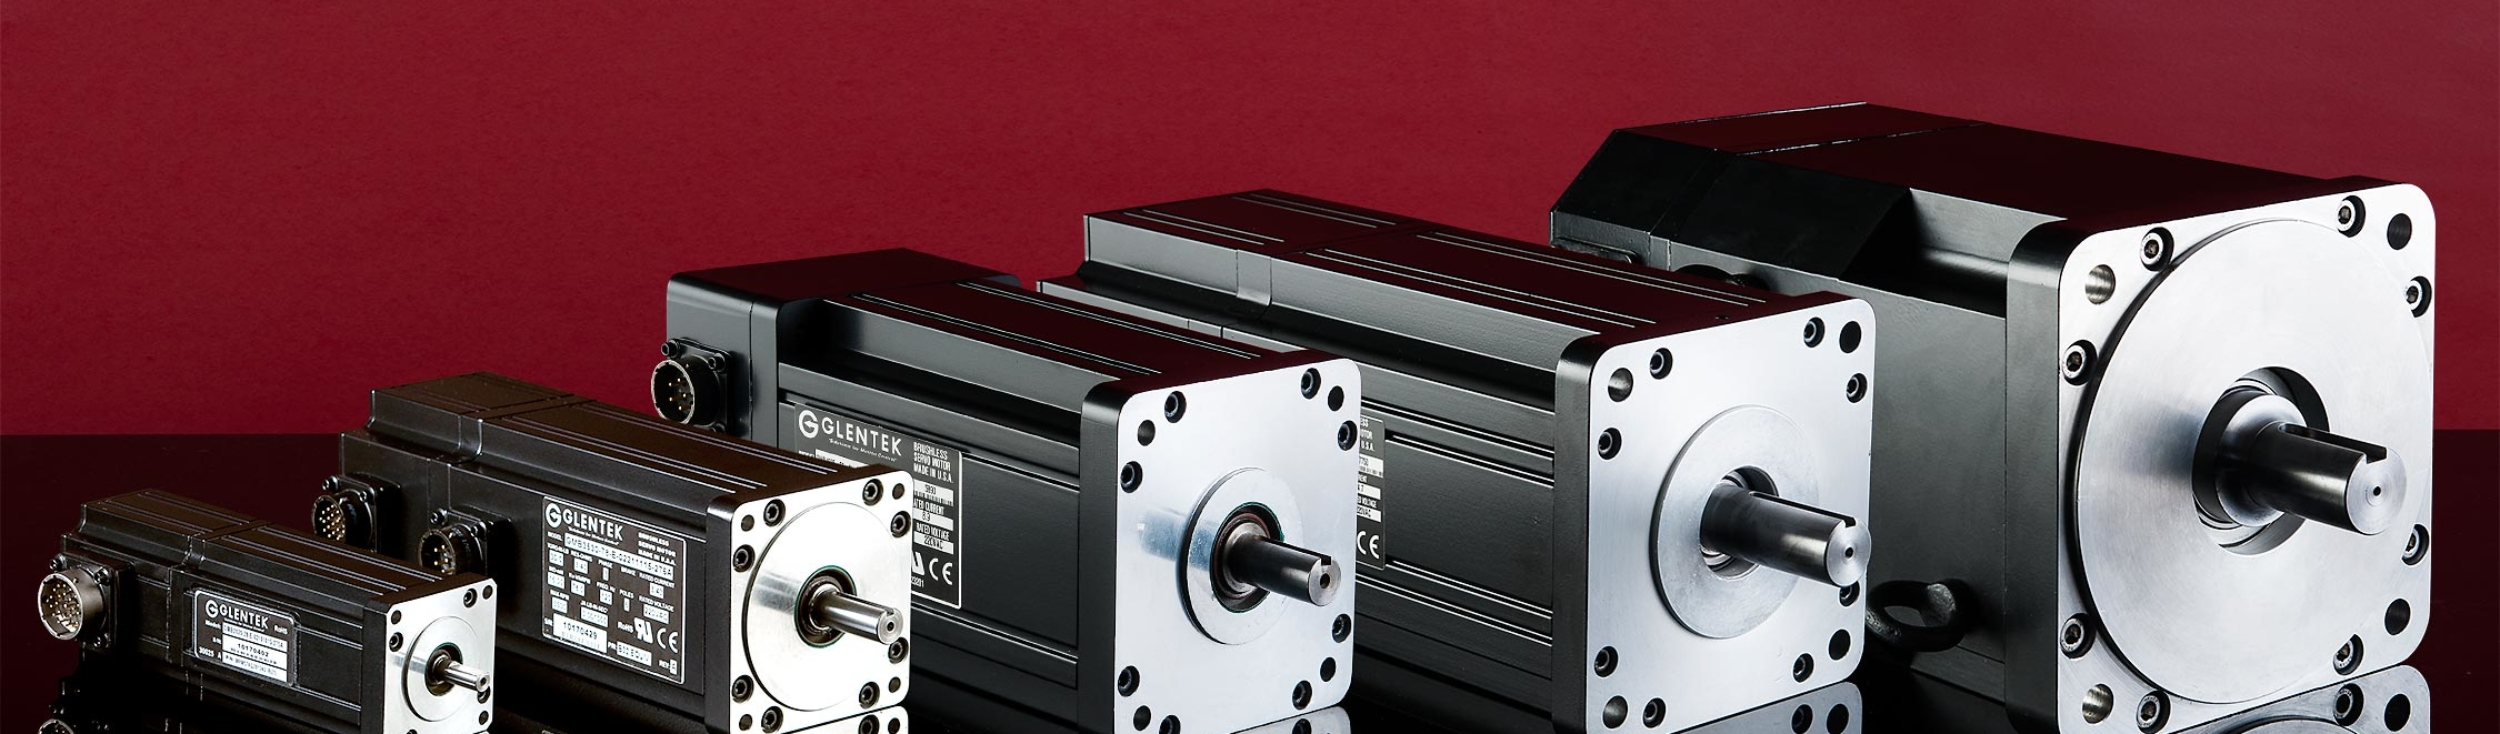 Servo Drives and Motors for OEM Applications | Glentek